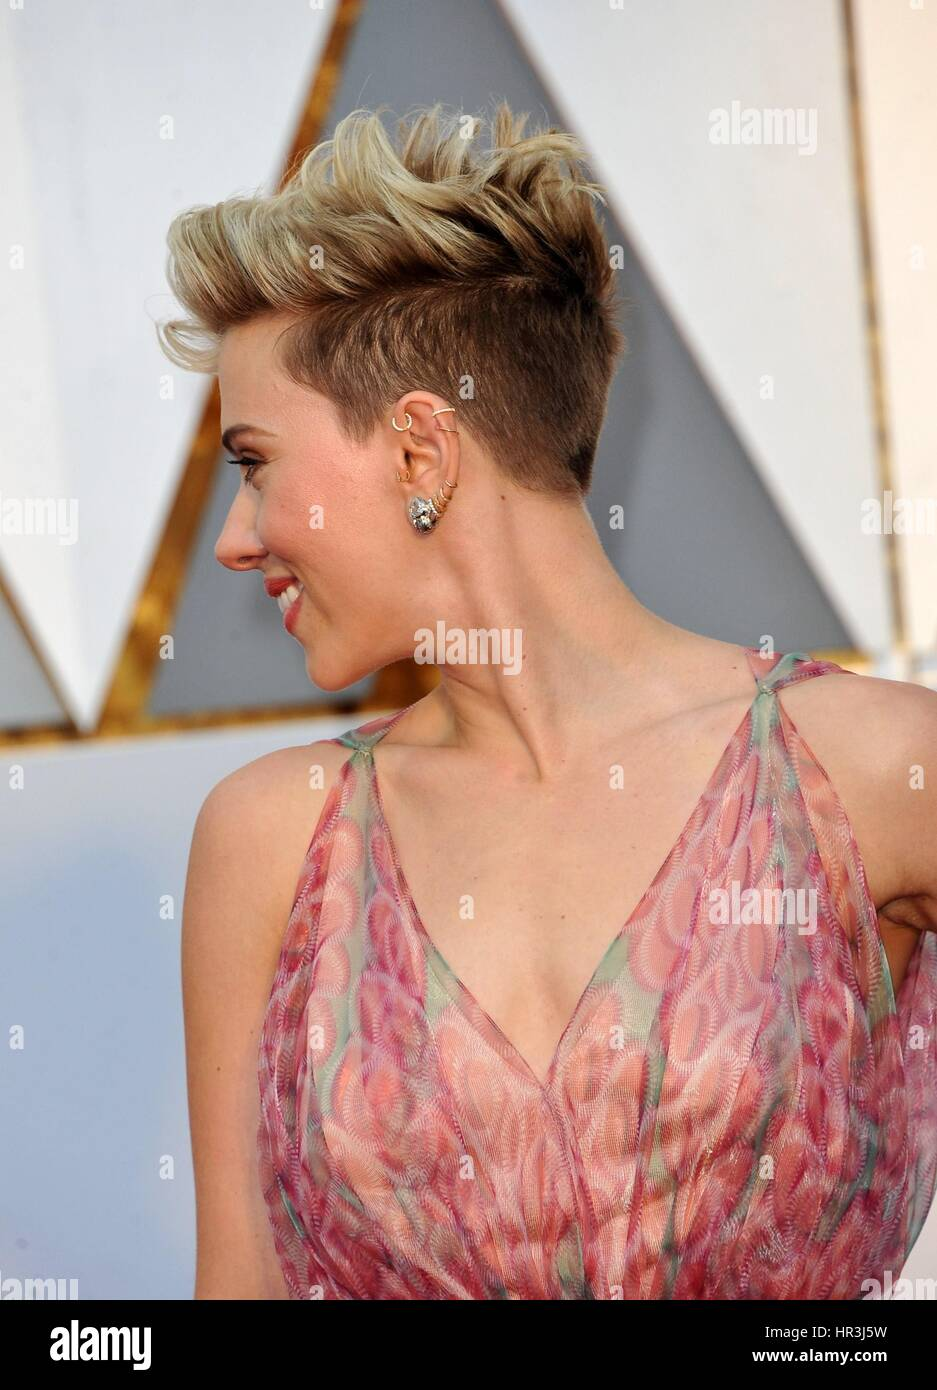 Los Angeles Ca Usa 26th Feb 2017 Scarlett Johansson At Arrivals Stock Photo Alamy